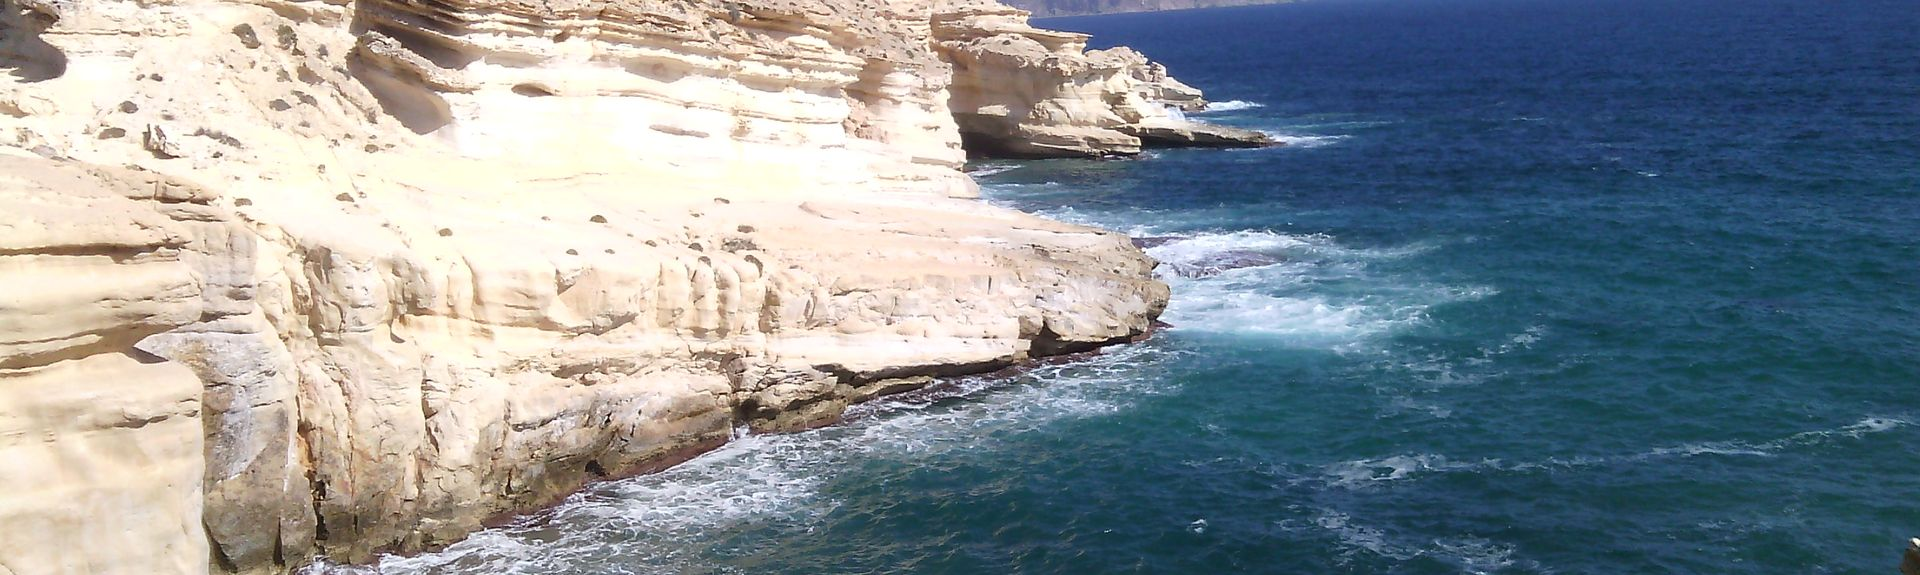 Playa de los Genoveses (plaża), Nijar, Andaluzja, Hiszpania